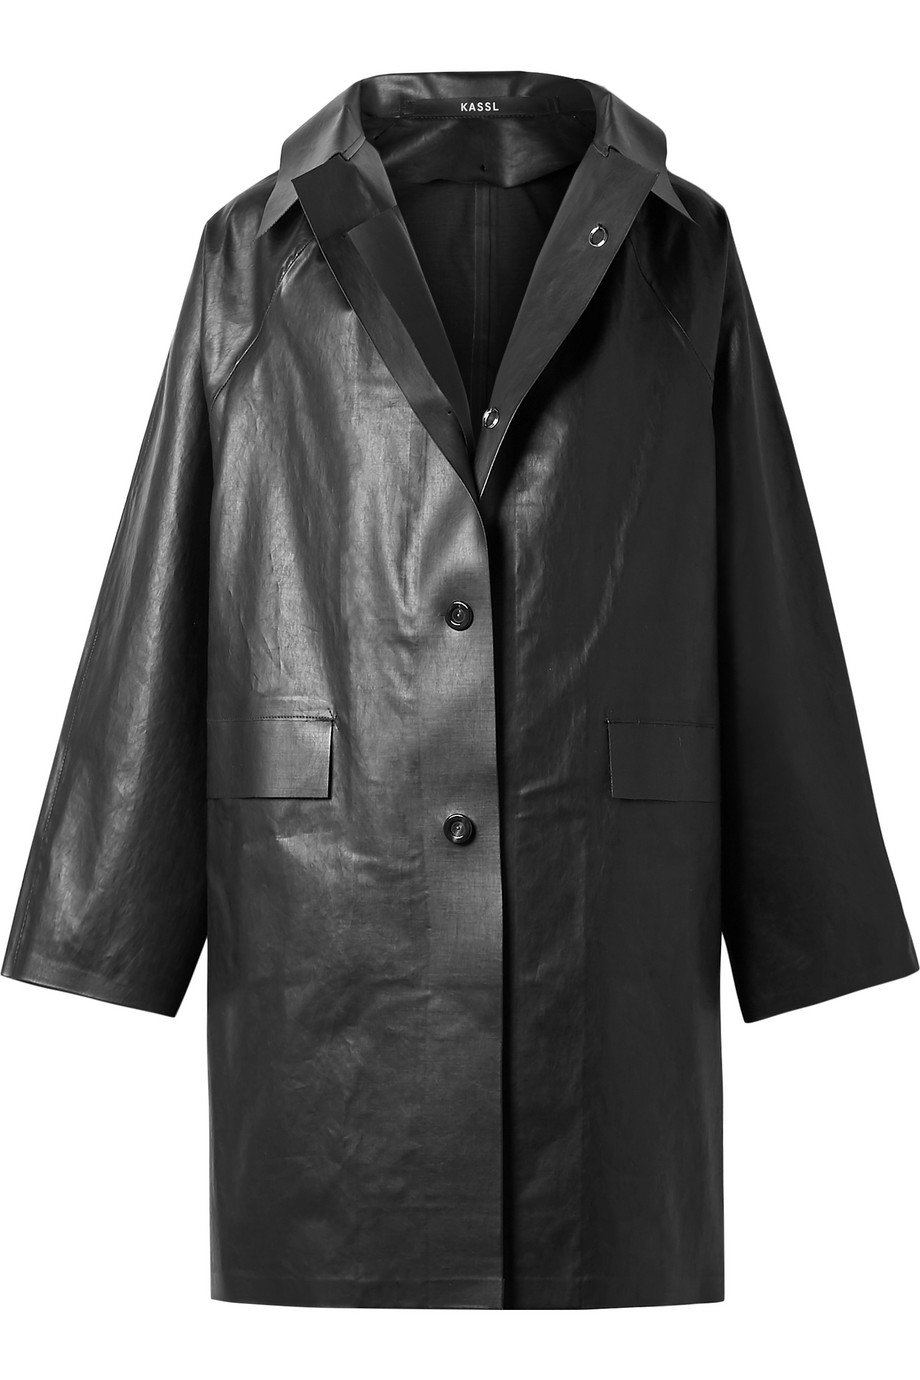 Kassl Editions | Coated cotton-blend coat | NET-A-PORTER.COM